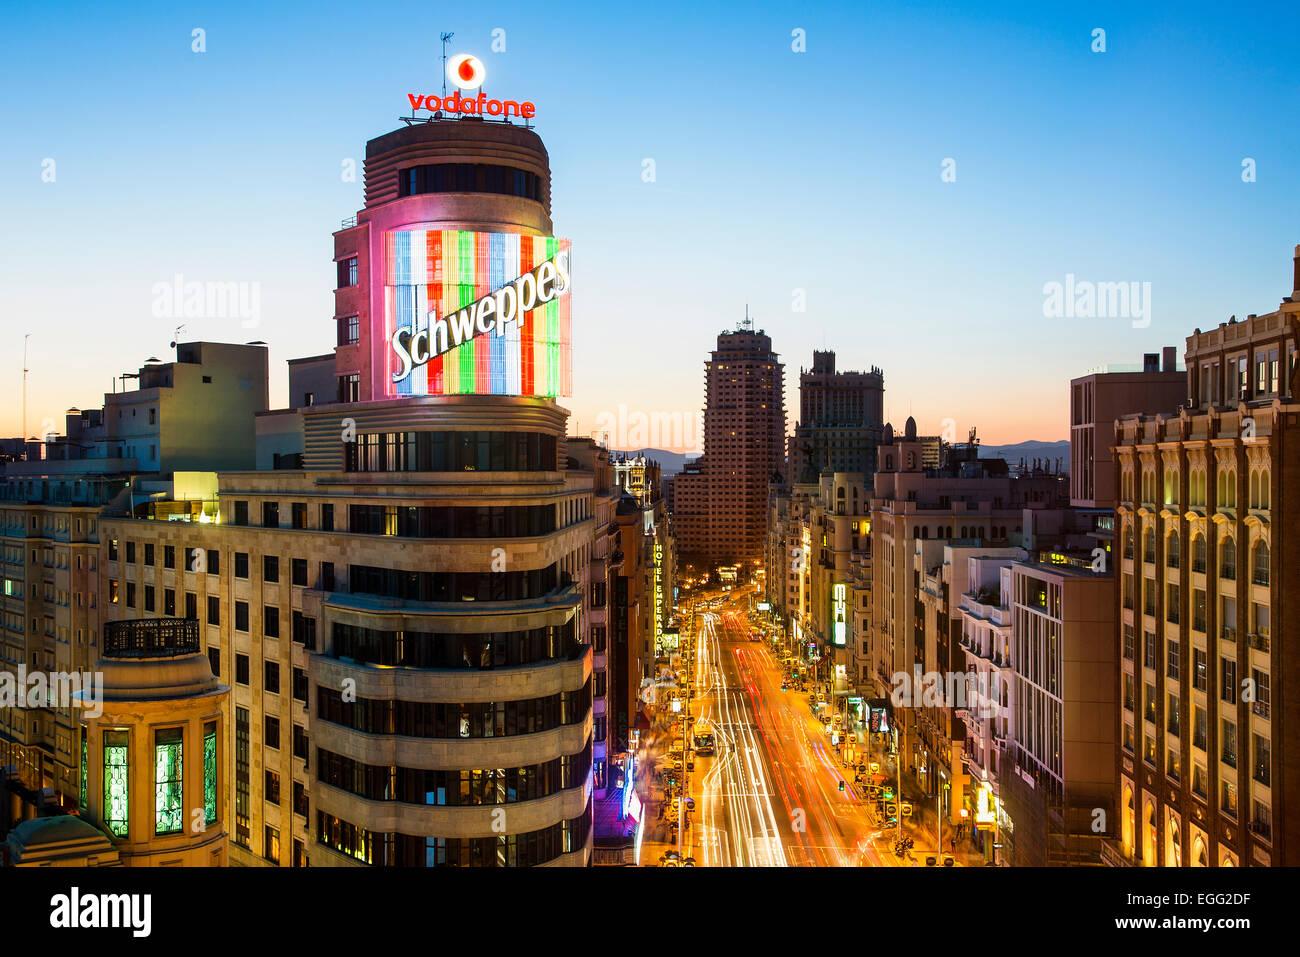 Skyline de Madrid al atardecer Imagen De Stock